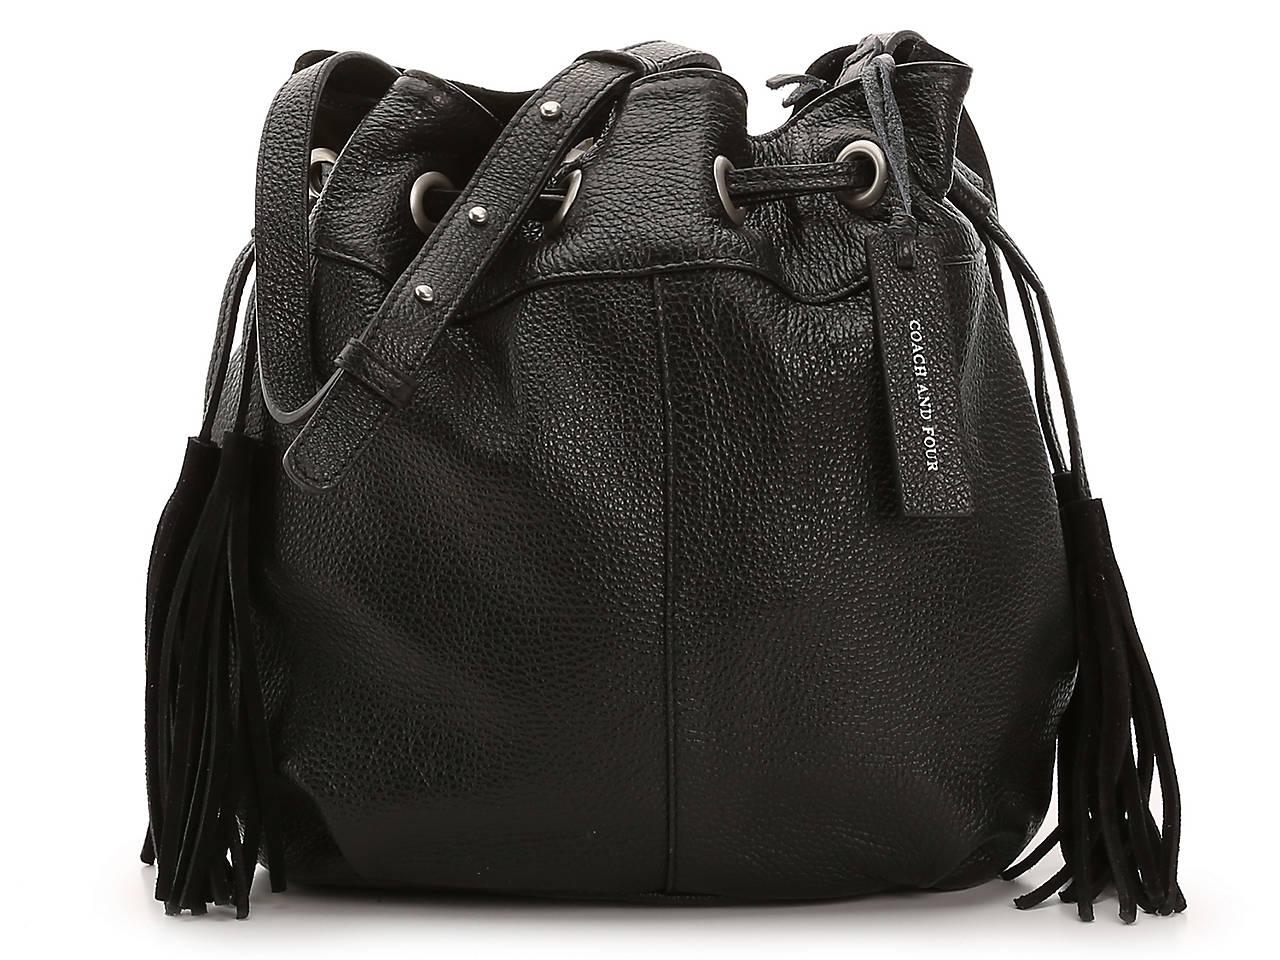 42e0a837f6edd Coach and Four Drawstring Leather Bucket Bag Women's Handbags & Accessories  | DSW